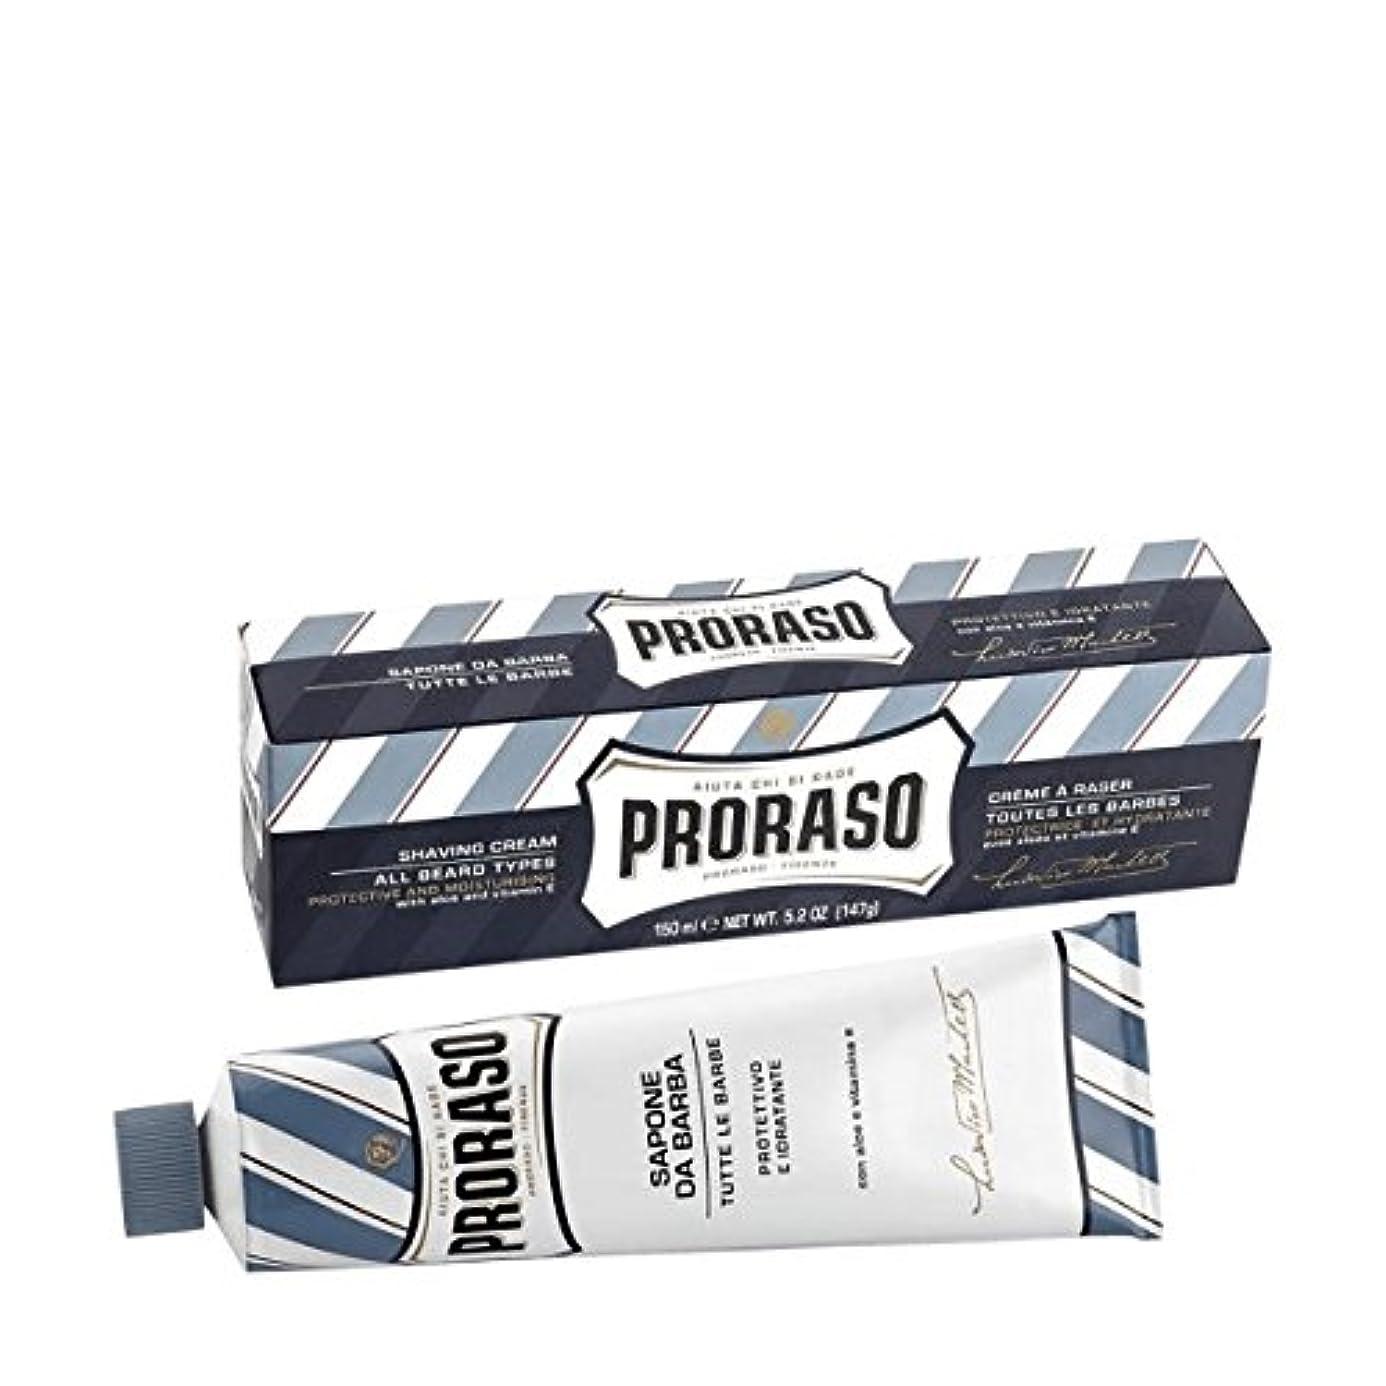 Proraso シェービングクリームチューブプロテクティブ150ml[海外直送品] [並行輸入品]